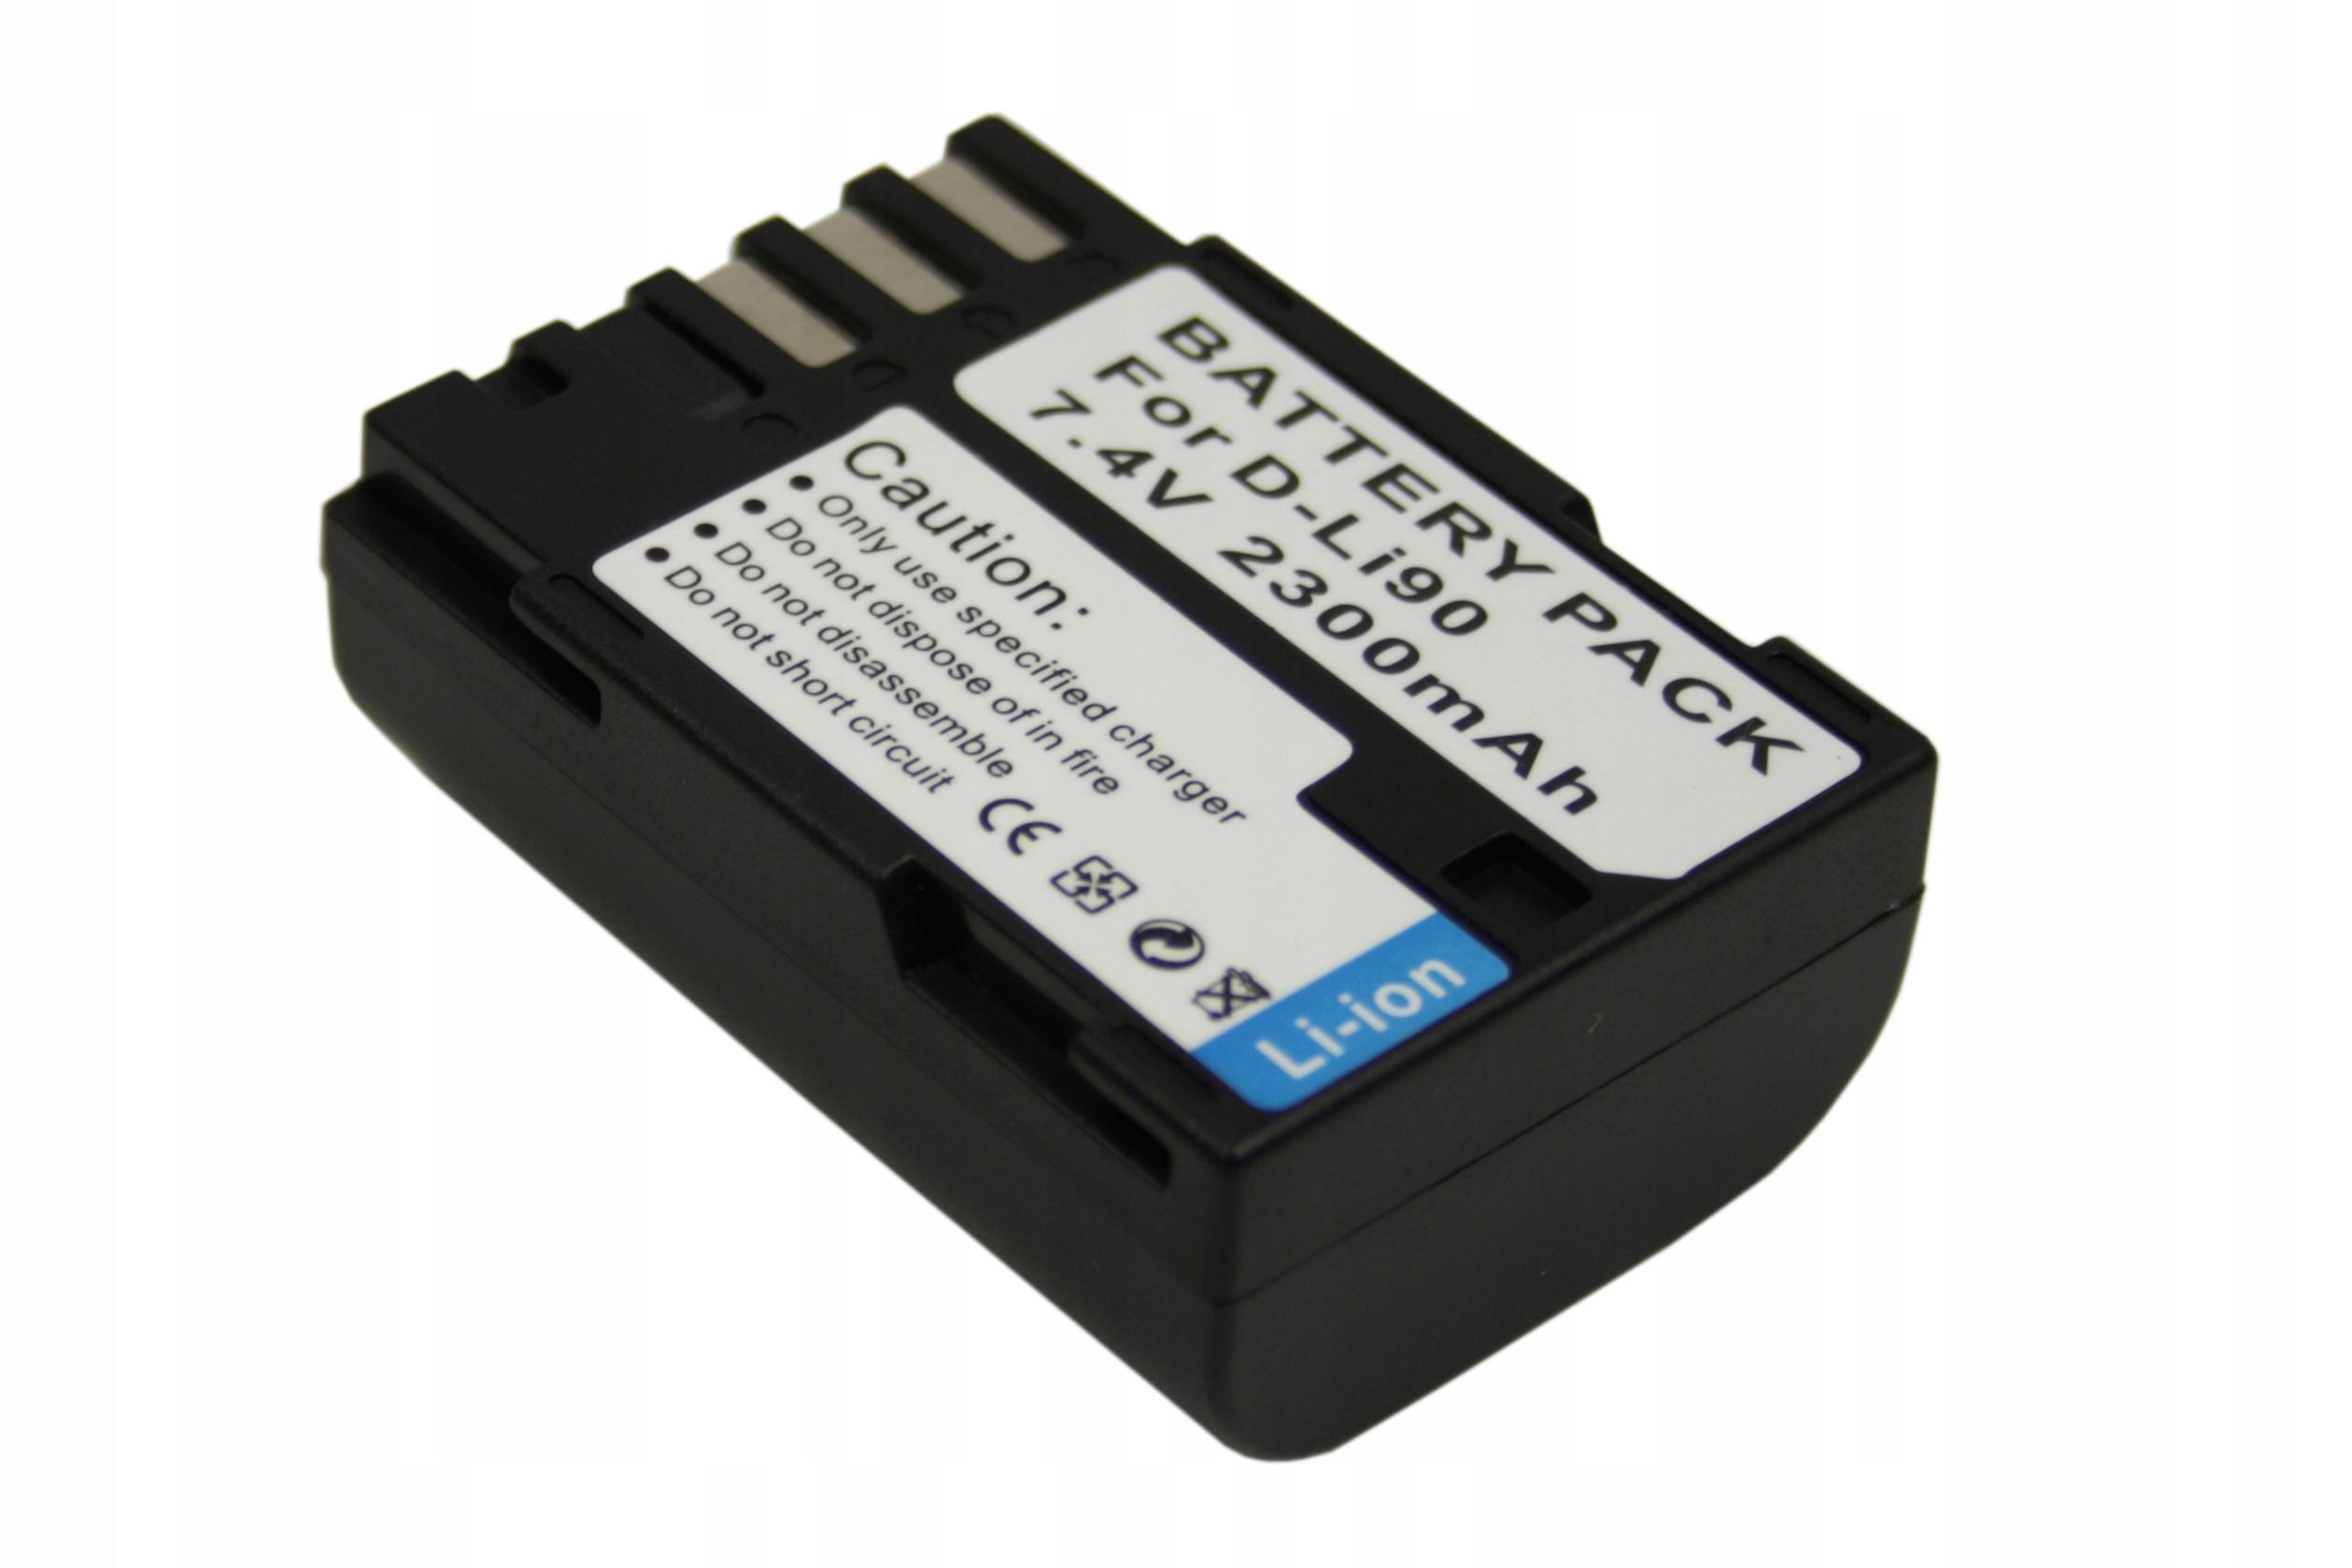 BATERIA AKUMULATOR PENTAX D-Li90 K-7 K7 K-5 K5 645 645D - Baterie do aparatów cyfrowych